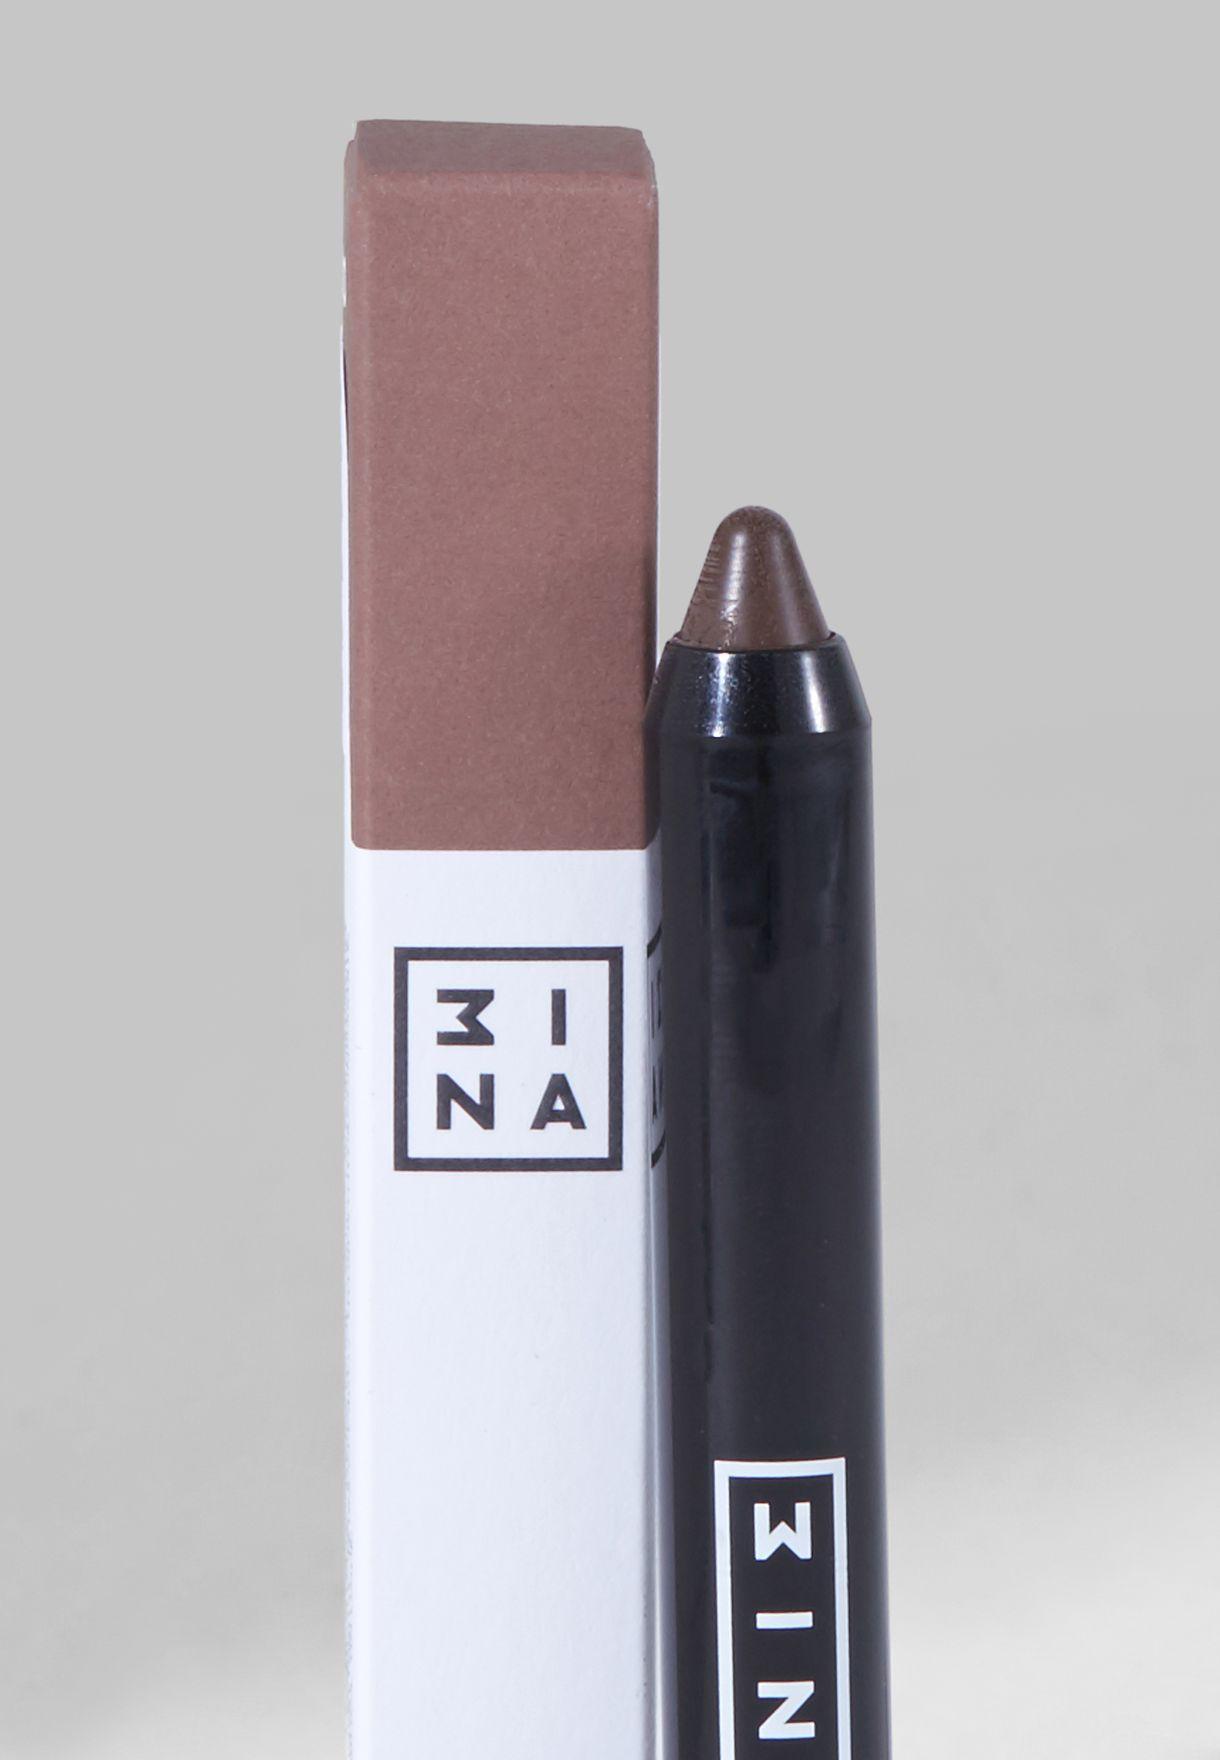 The Pencil Eyeshadow 100